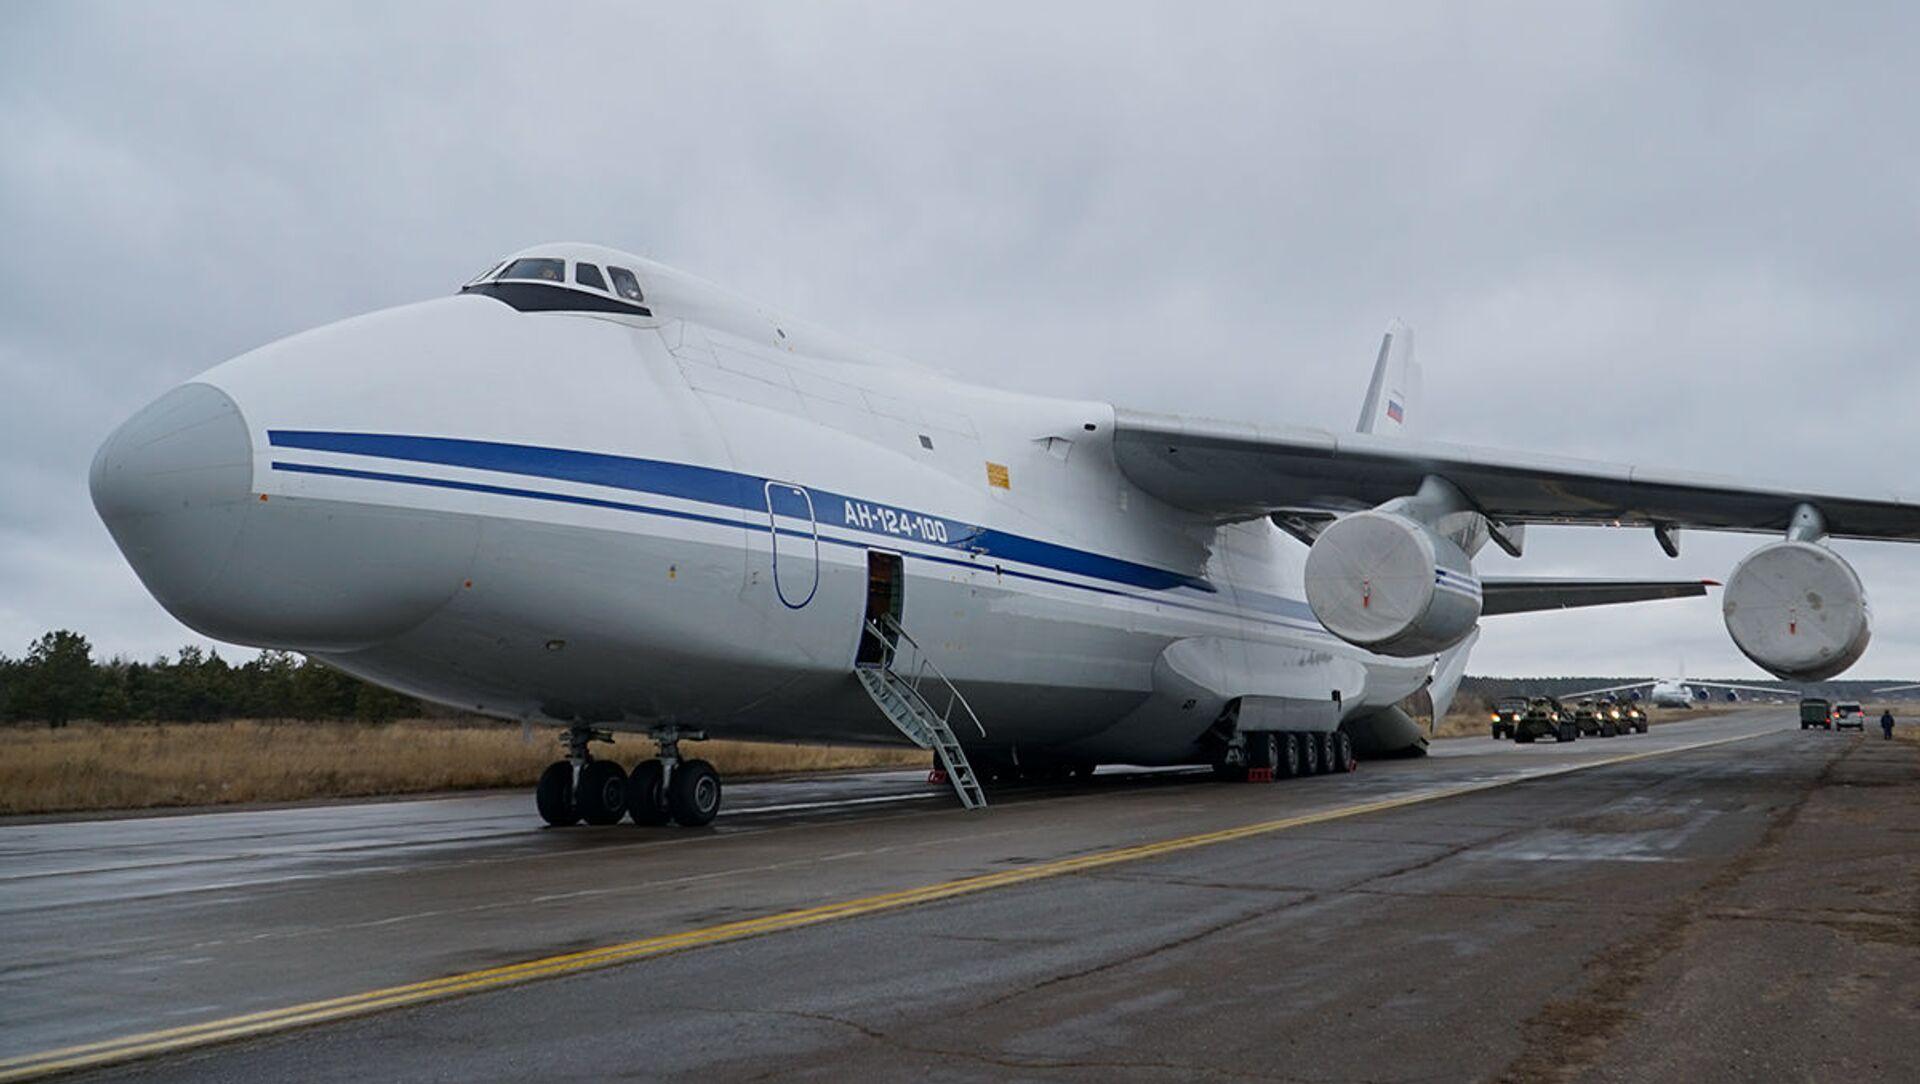 Самолет Ан-124 «Руслан» на аэродроме Еревана, Армения - Sputnik Italia, 1920, 14.03.2021